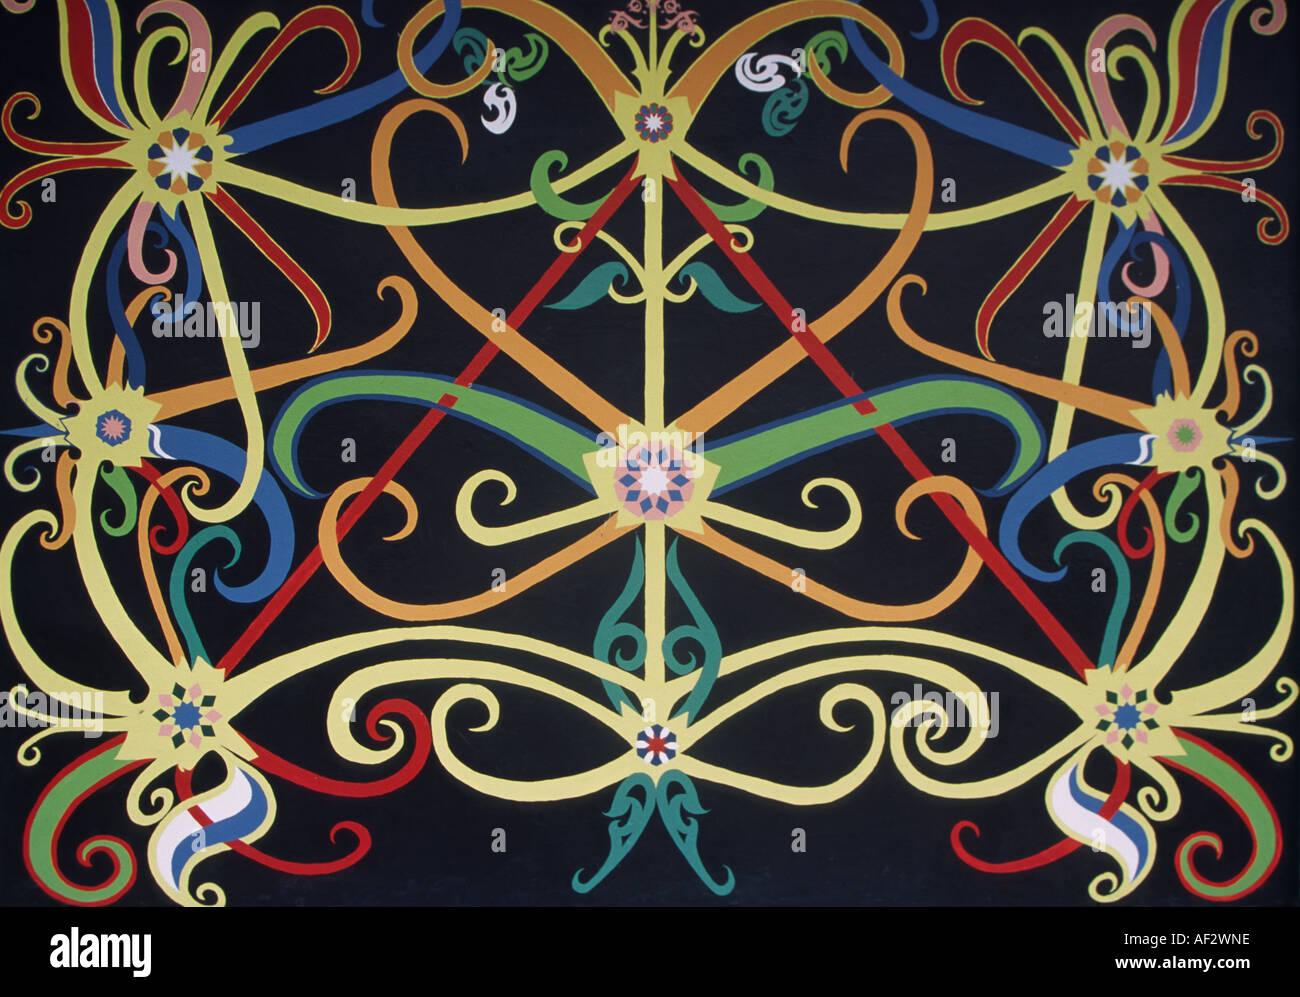 traditionelle iban motiv design muster kunstwerk sarawak borneo - Iban Muster